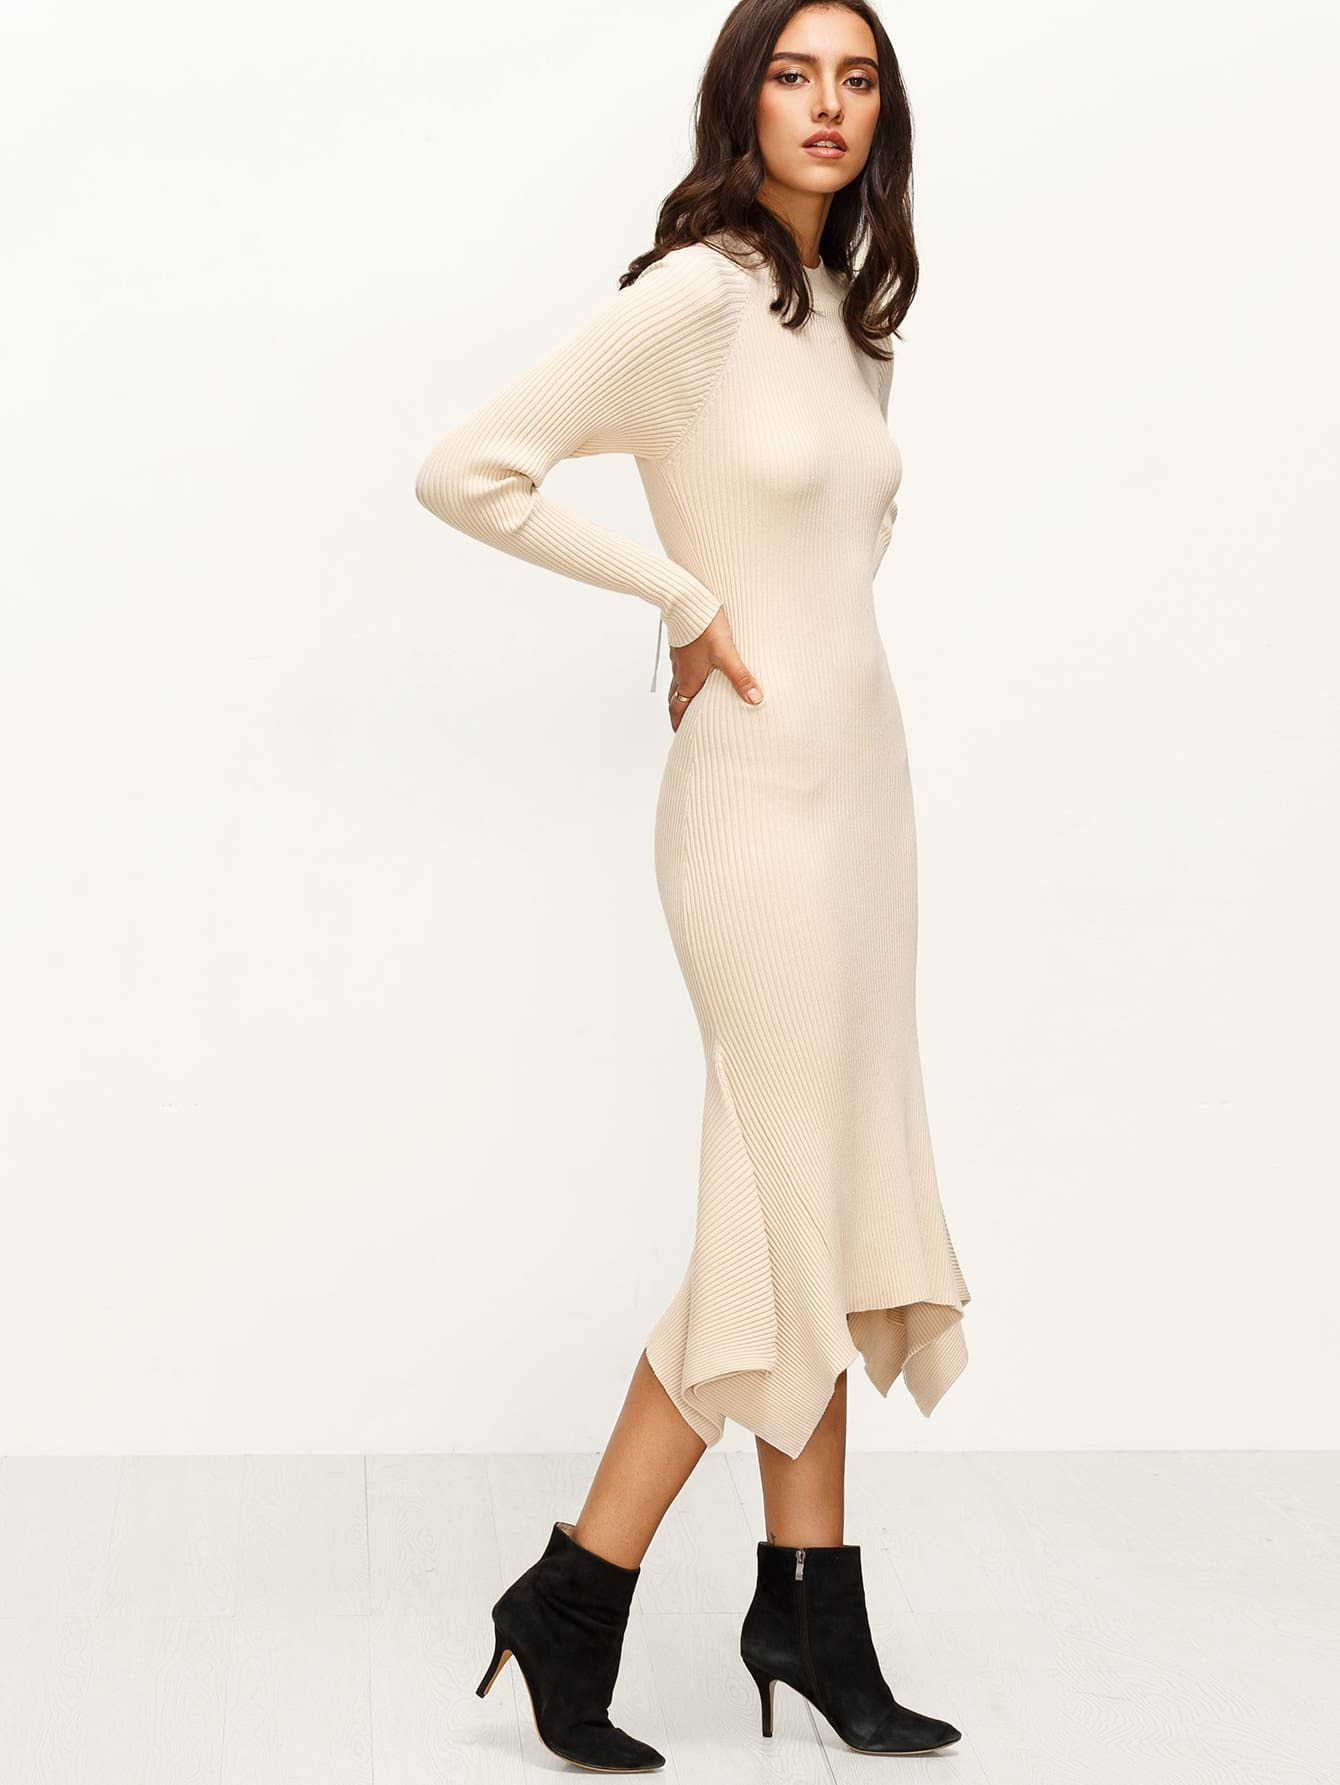 Apricot Ribbed Knit Cutout Lace Up Back Asymmetric Dress